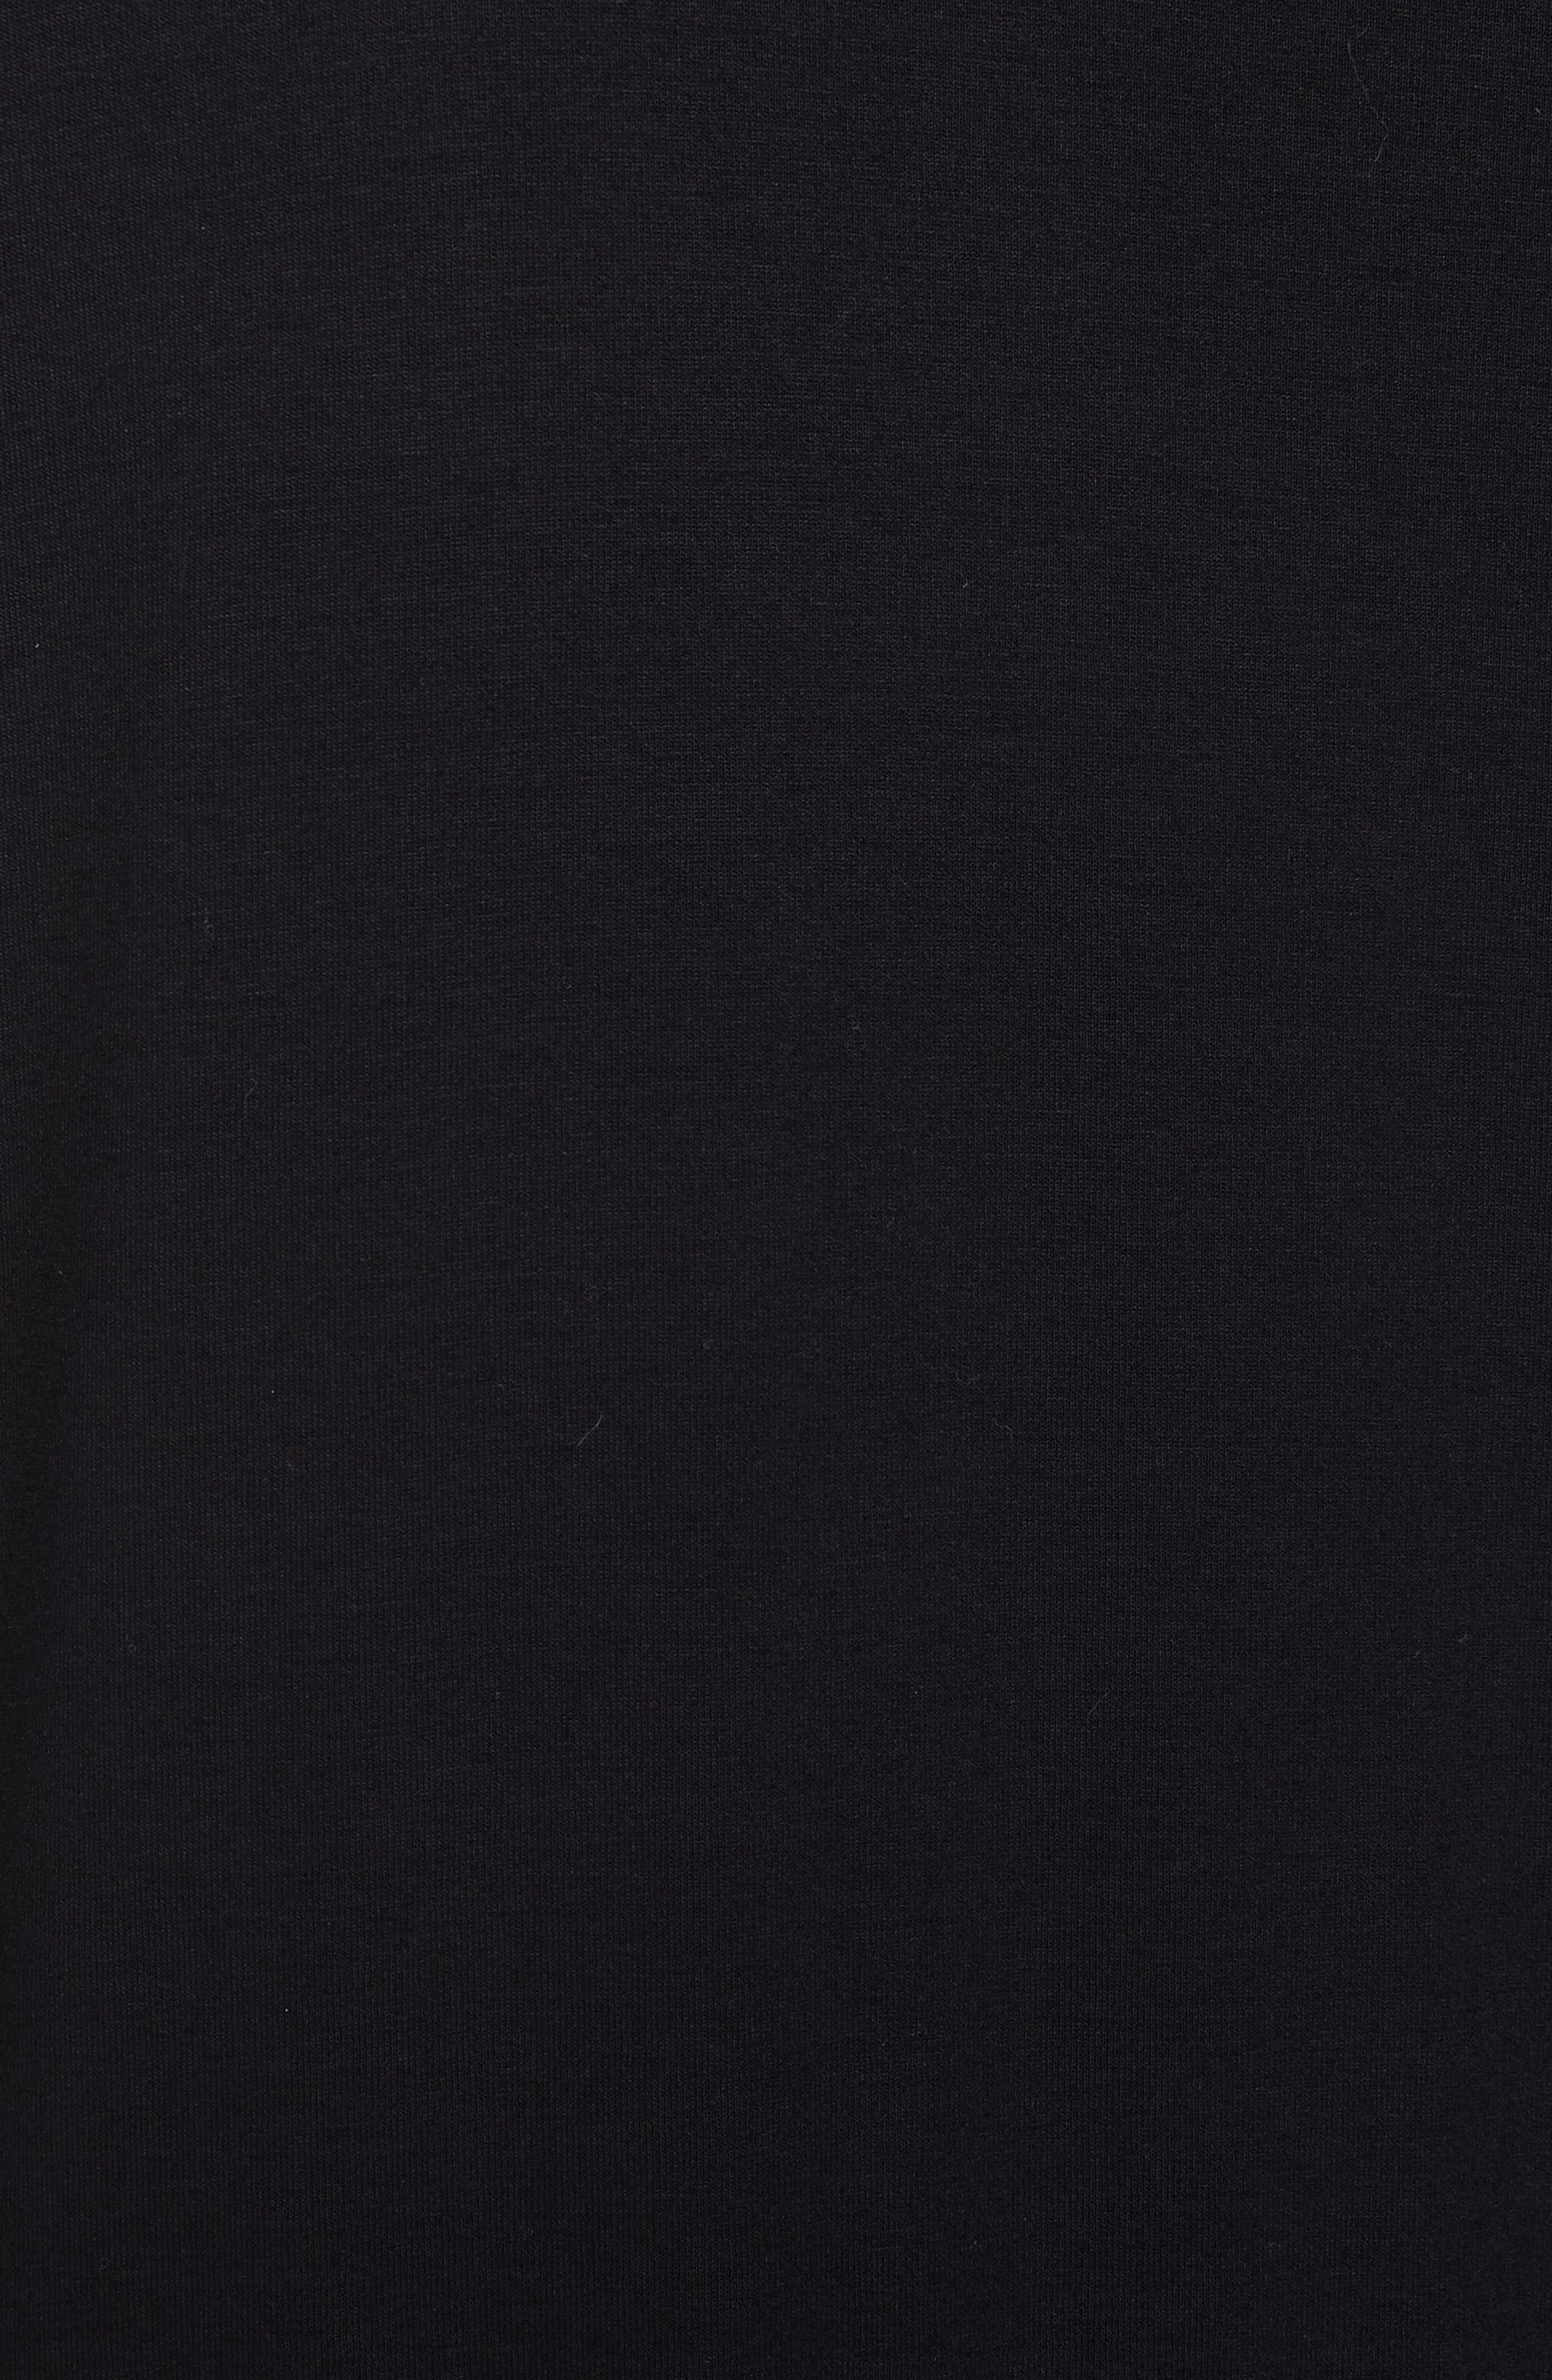 Drawstring Waist Dress,                             Alternate thumbnail 6, color,                             BLACK